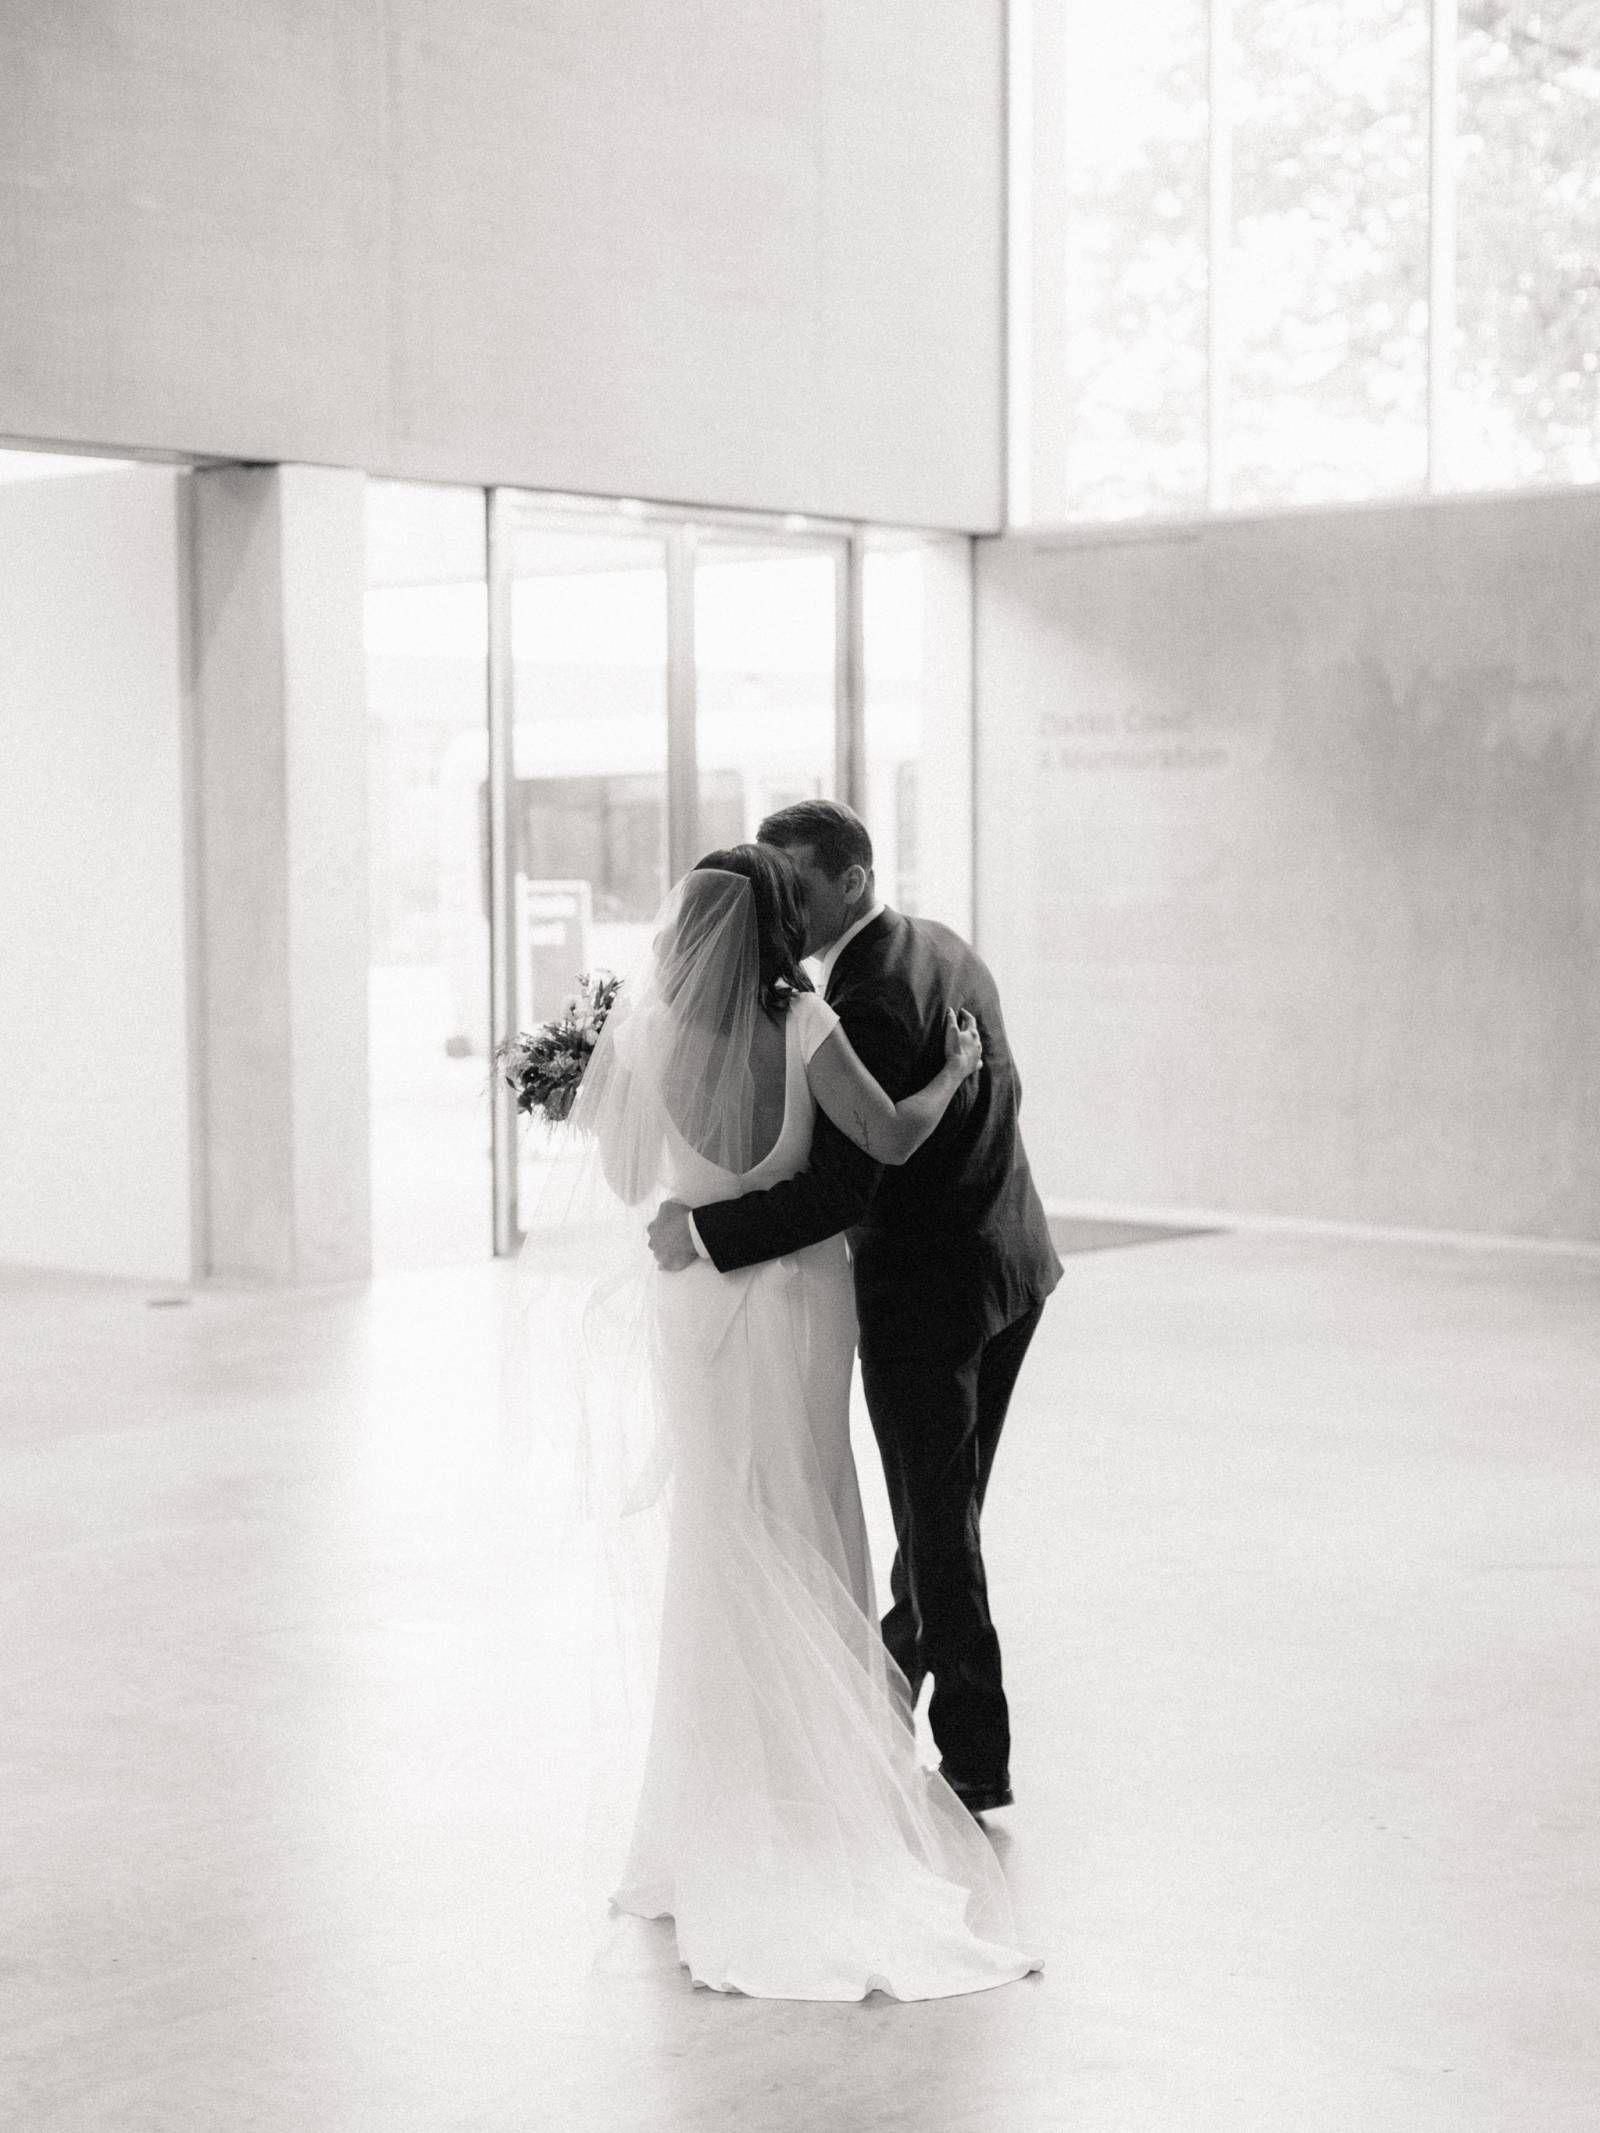 Modern minimalist wedding in st louis missouri via magnolia rouge